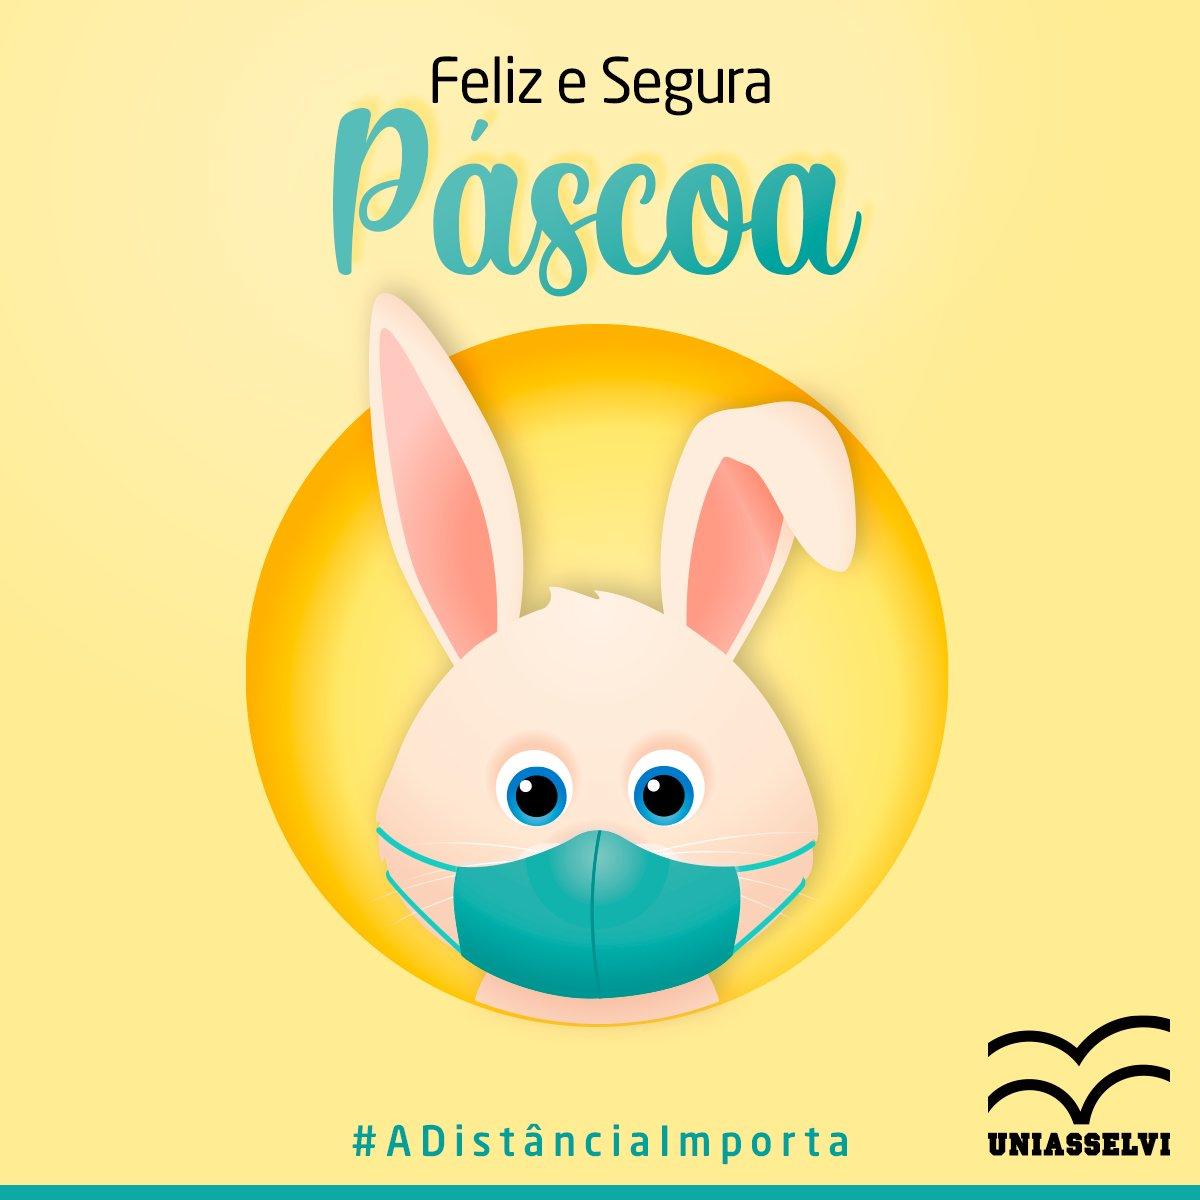 Que nossos corações, mesmo distantes, estejam unidos. Feliz Páscoa!  #Páscoa #chocolates #FelizPáscoa #coelho #PáscoaEmCasa https://t.co/C3cdUMUuOA